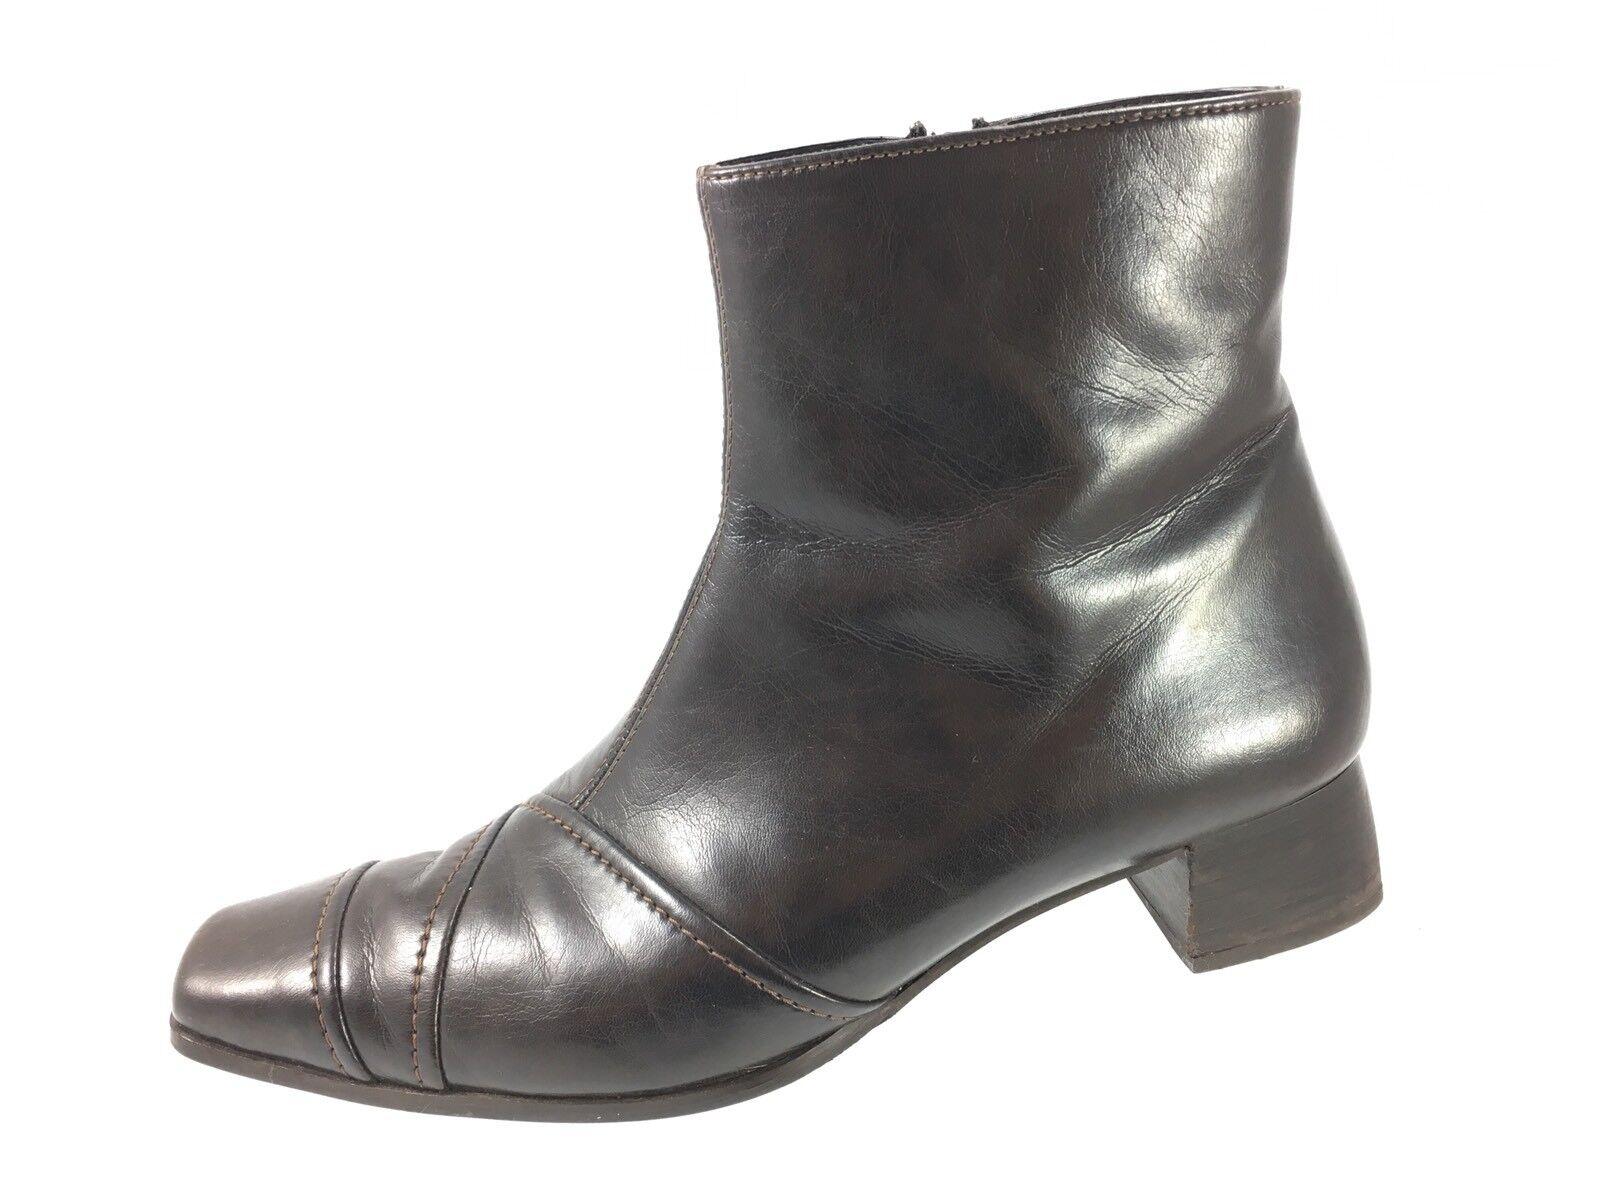 SH6 Paul Grün Munchen 8 UK 5.5 US 8 Munchen Braun Leder Zip Ankle Boot Block Heel c9c536